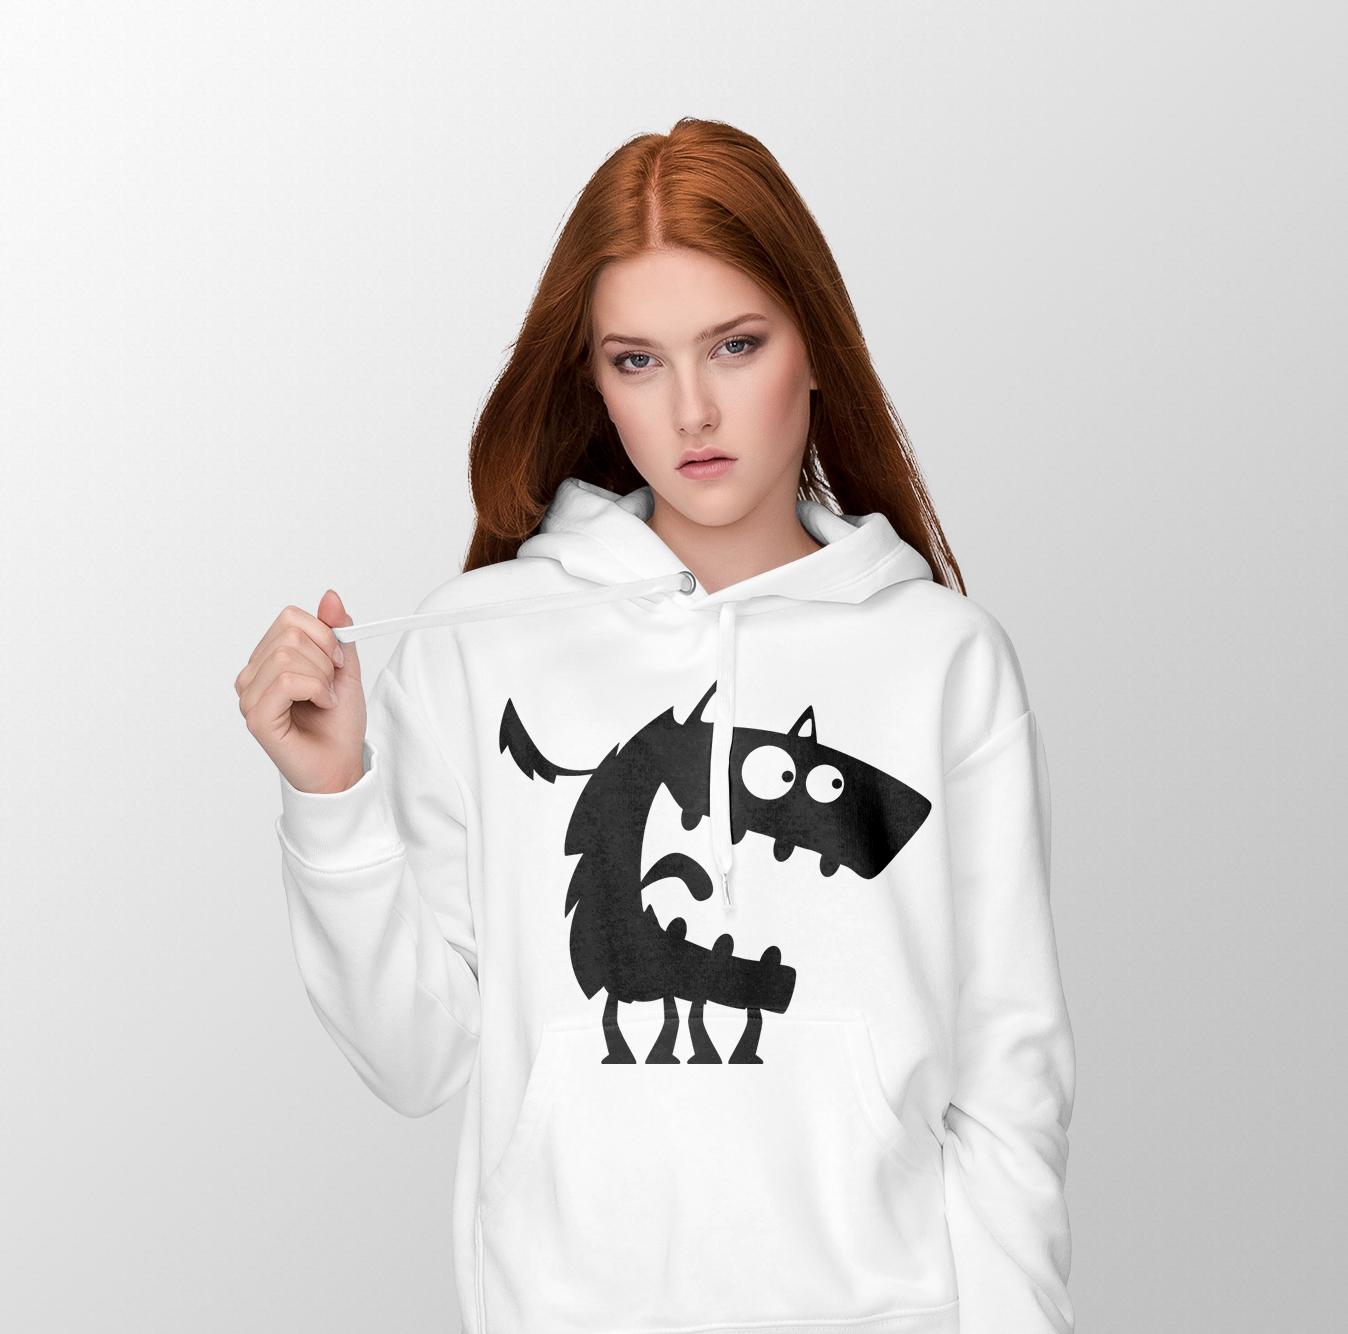 hoodie-female-front4